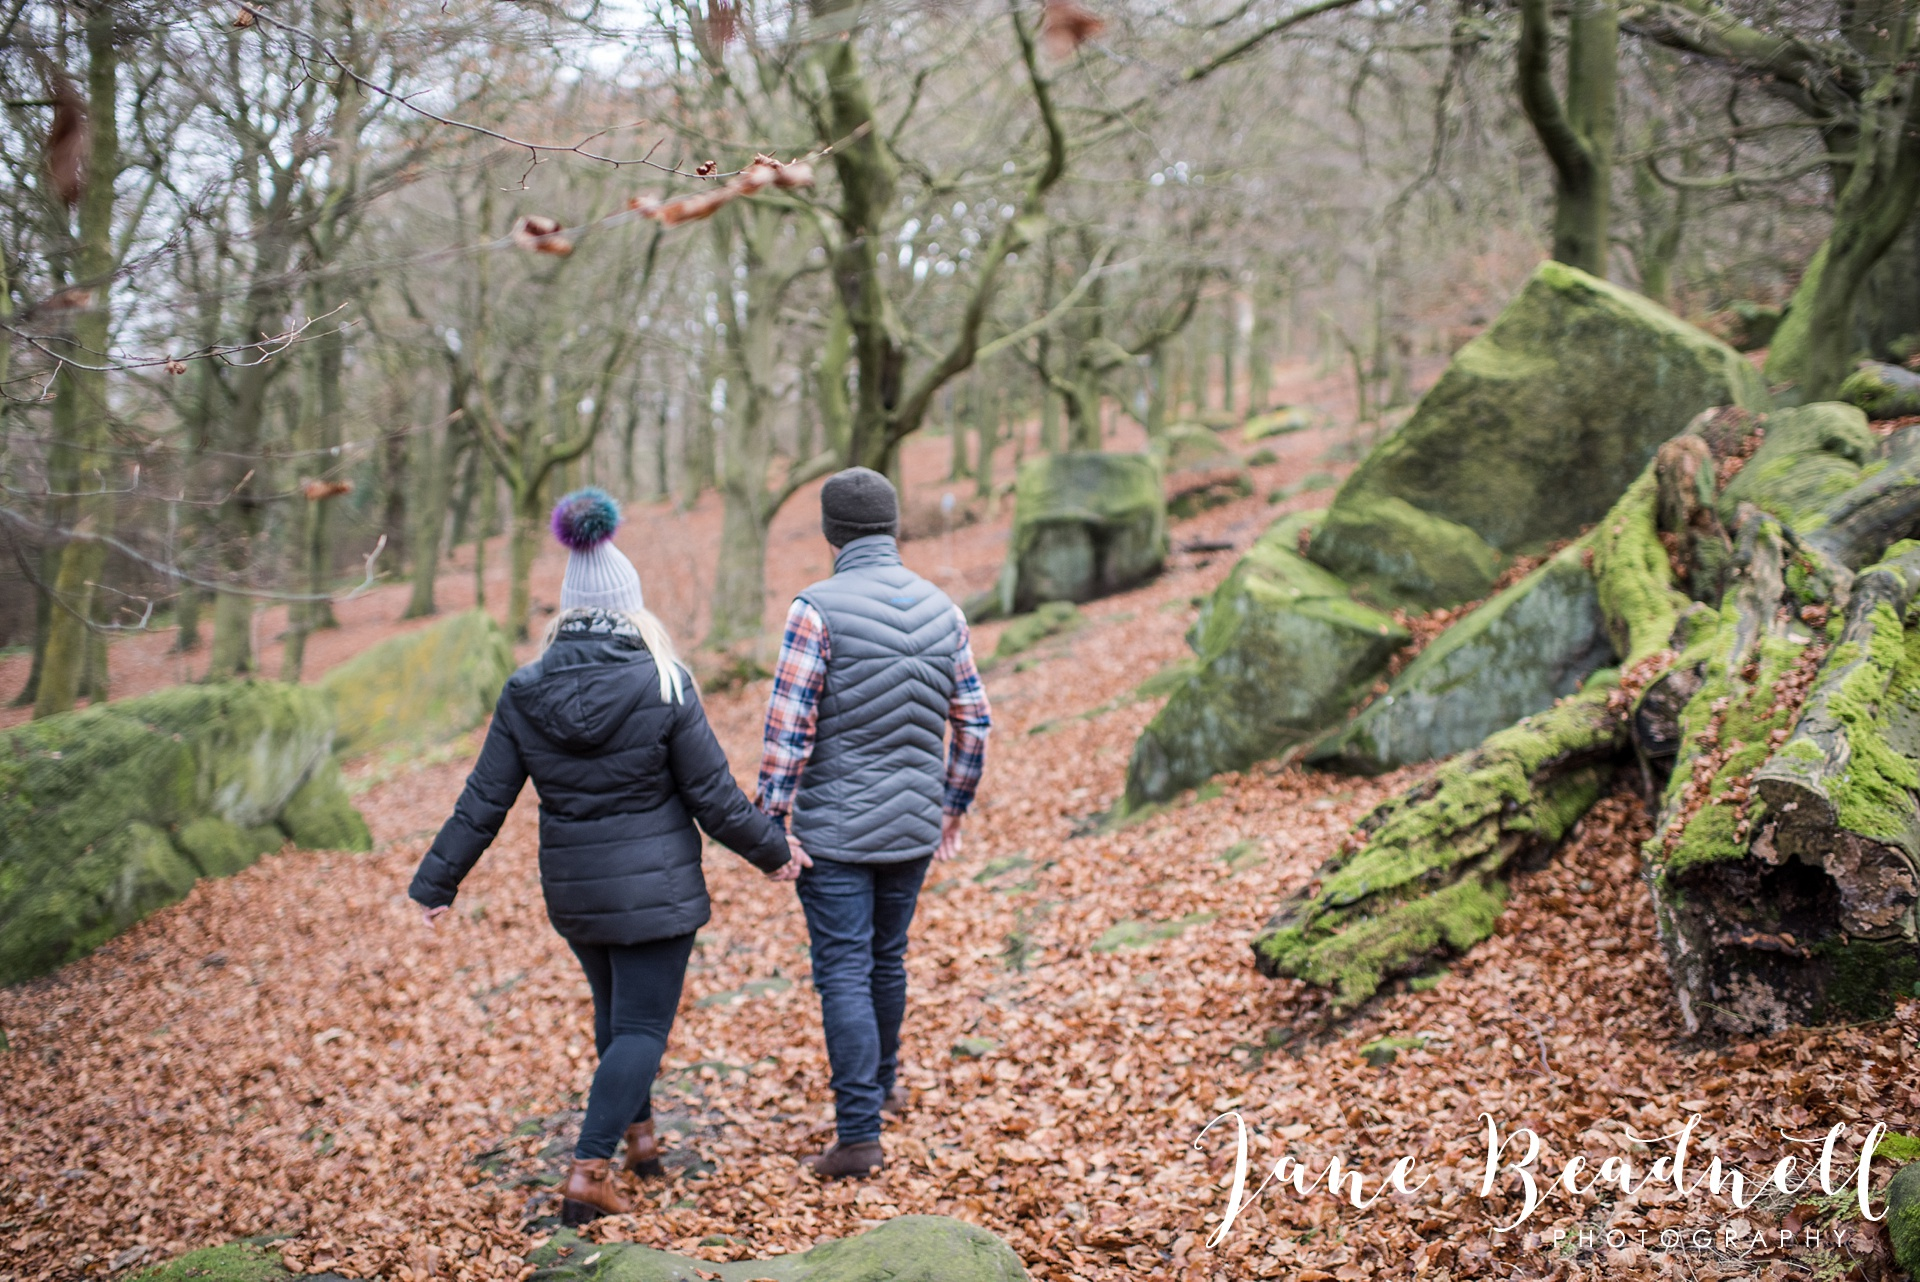 yorkshire-wedding-photographer-jane-beadnell-photography-uk-and-destination-wedding-photographer-engagement-shoot_0061